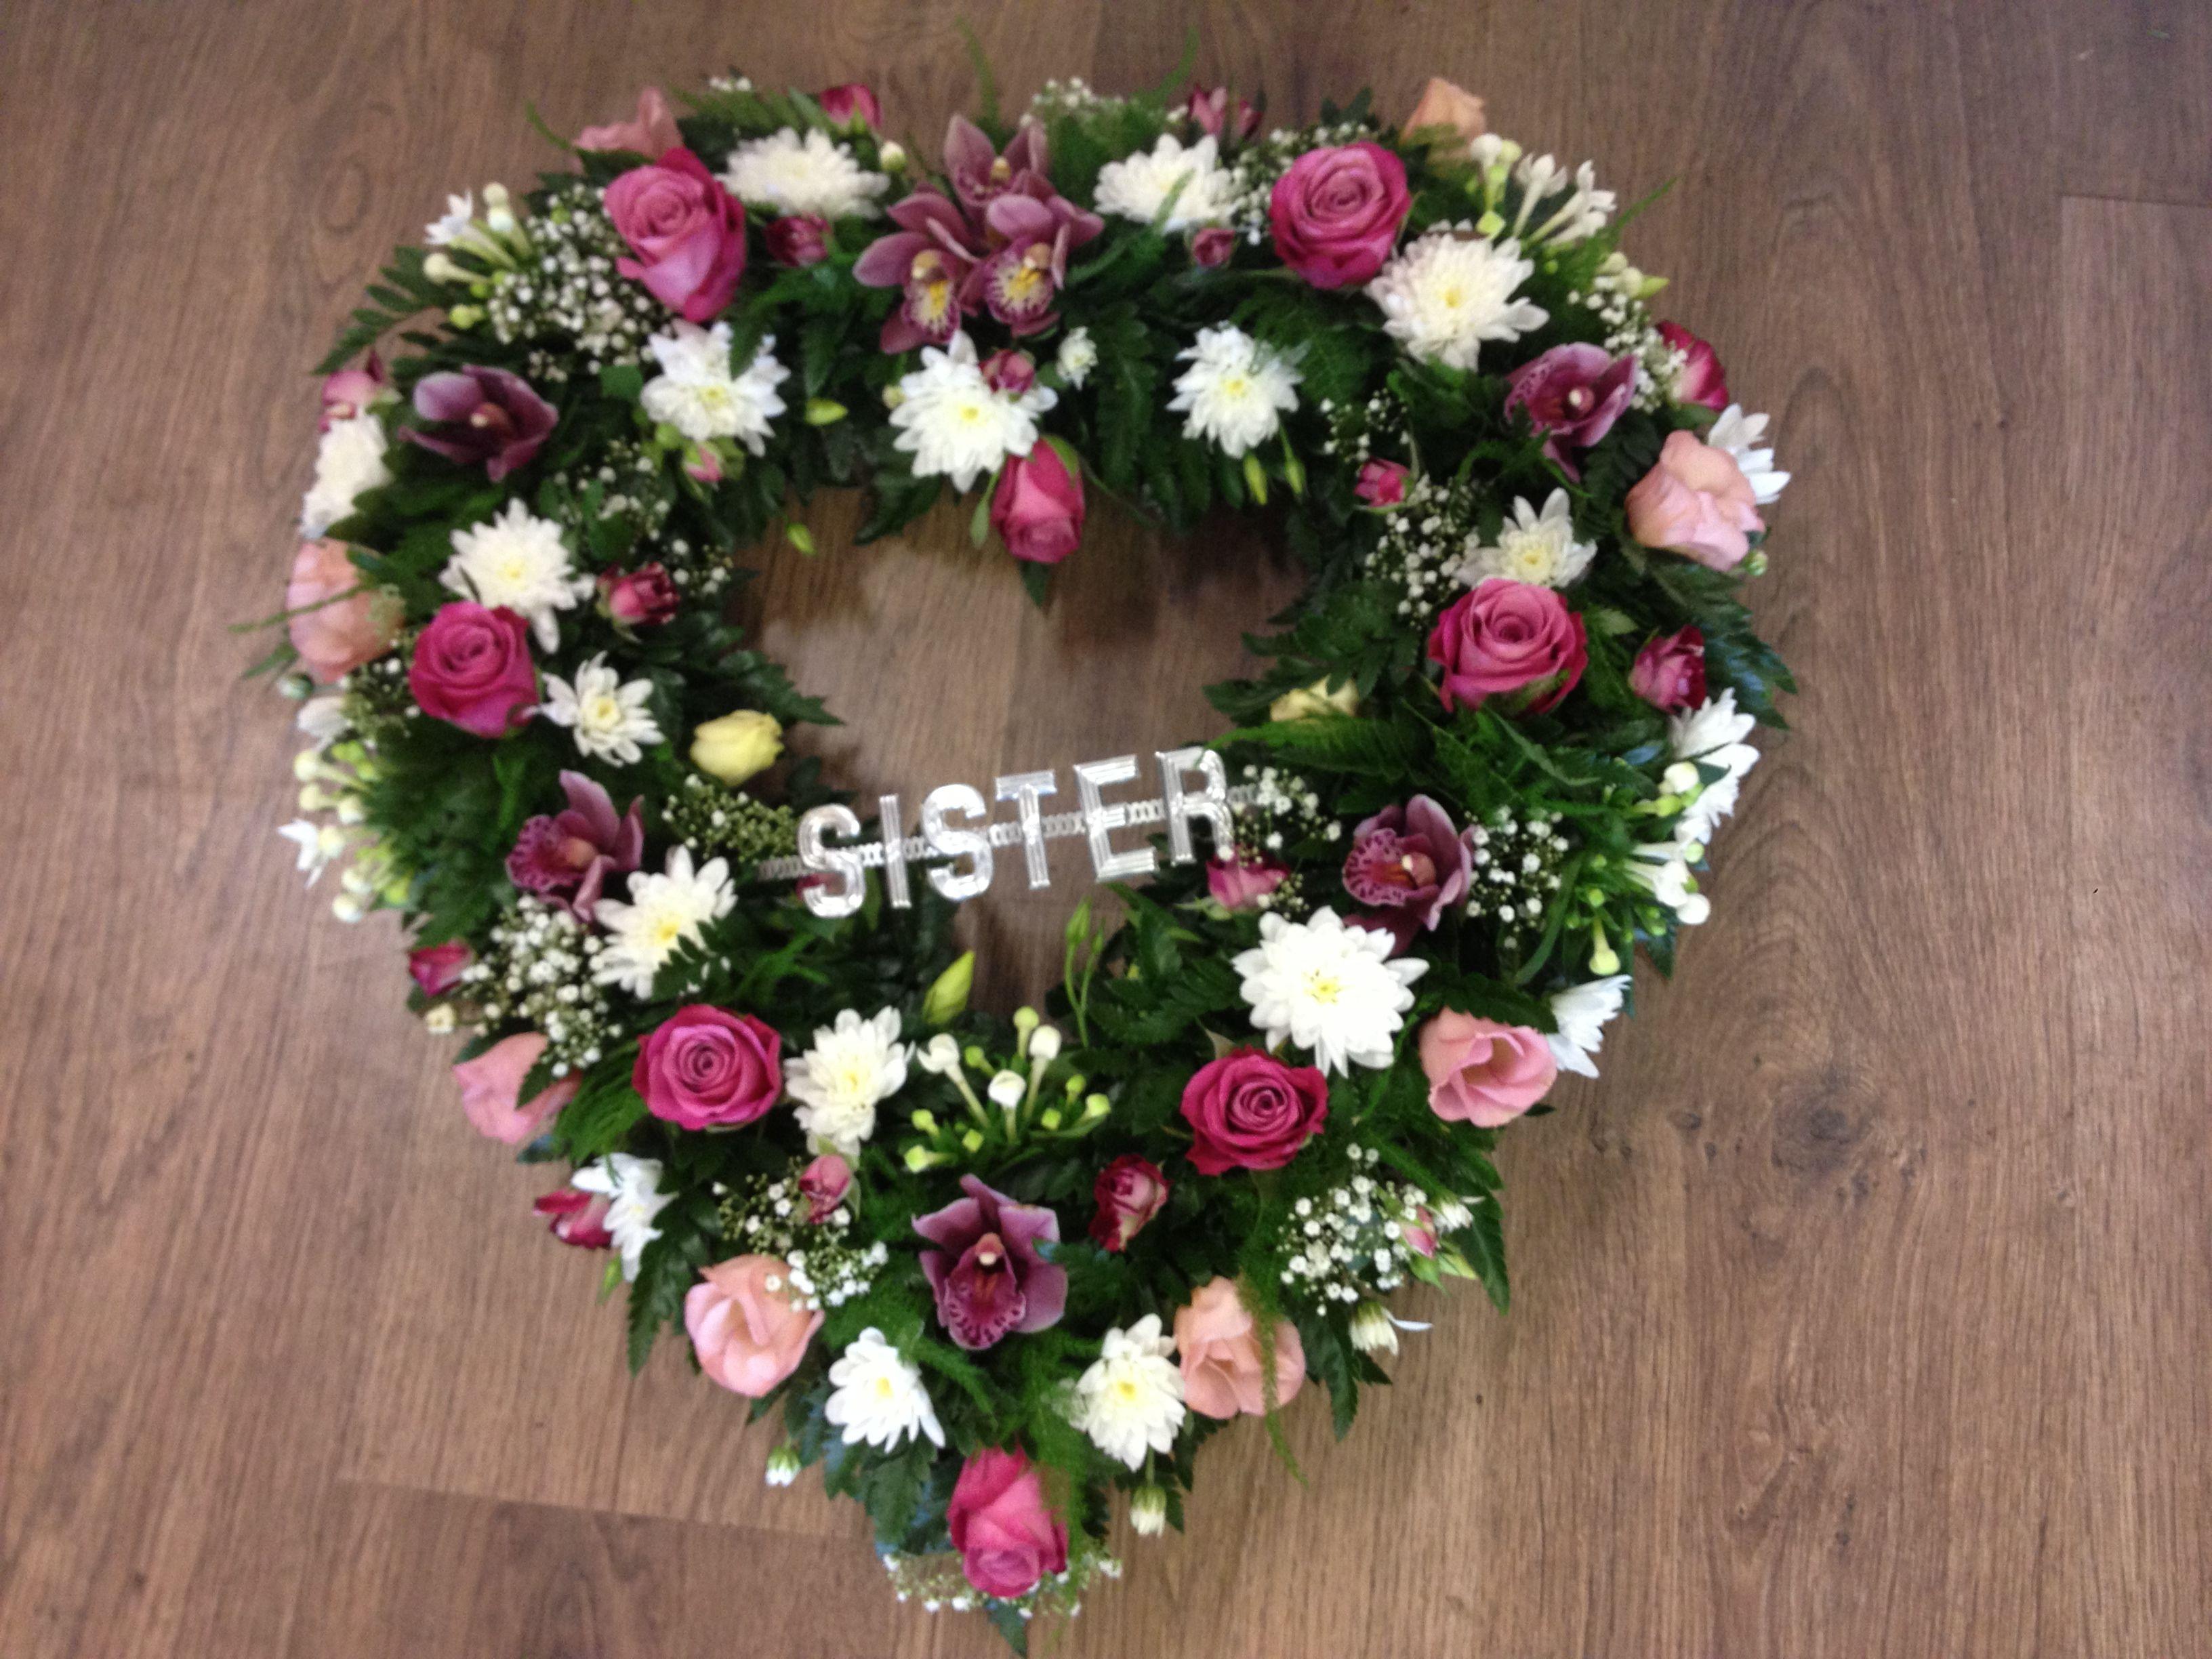 Heart shaped wreath crafts diy pinterest wreaths sympathy heart shaped wreath izmirmasajfo Gallery